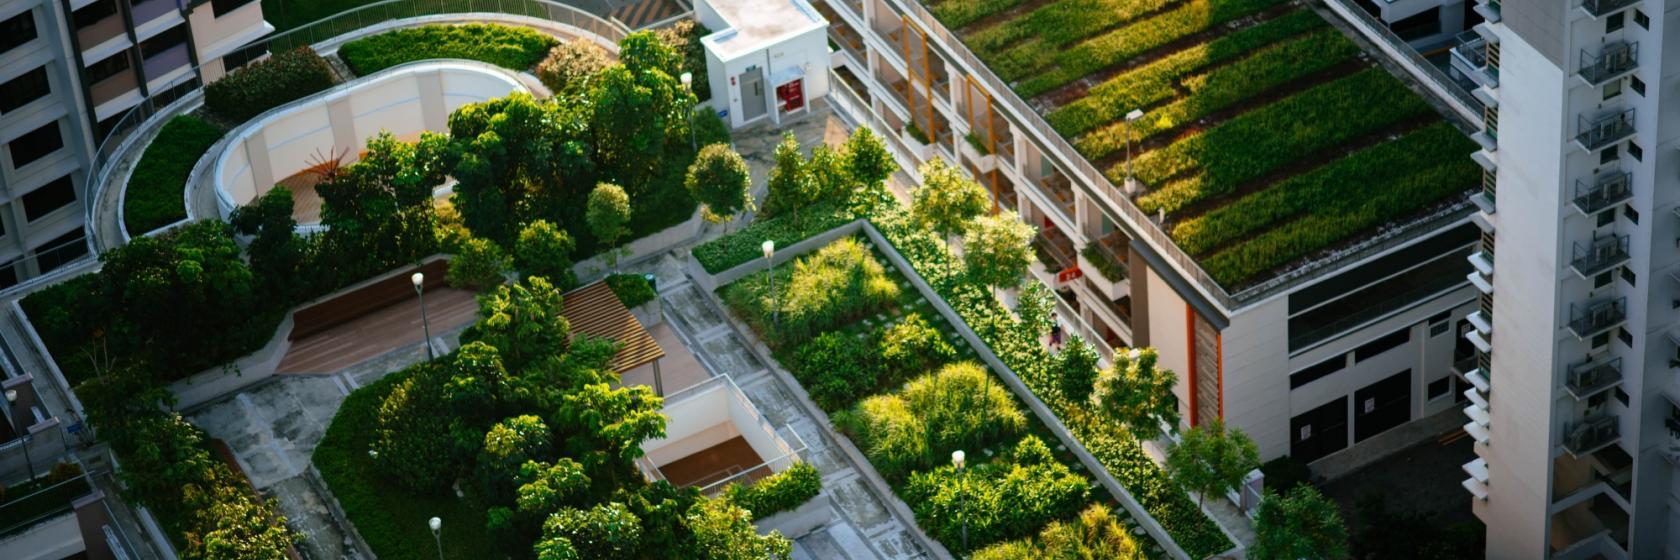 Klimagerechte Stadtplanung